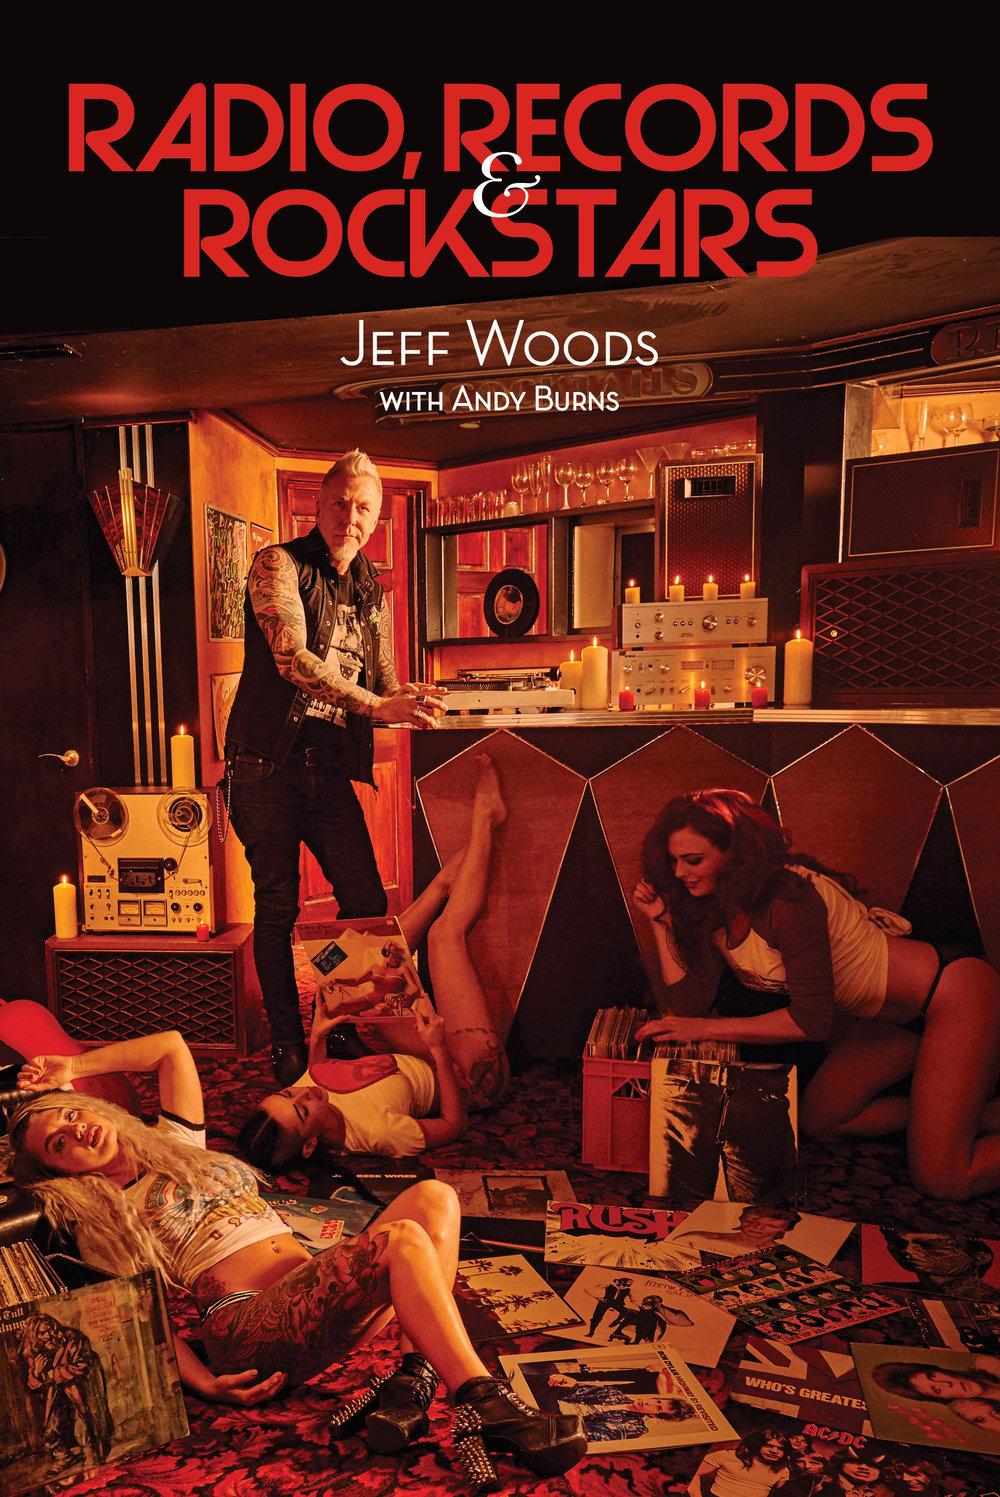 Image of Radio, Records & Rockstars